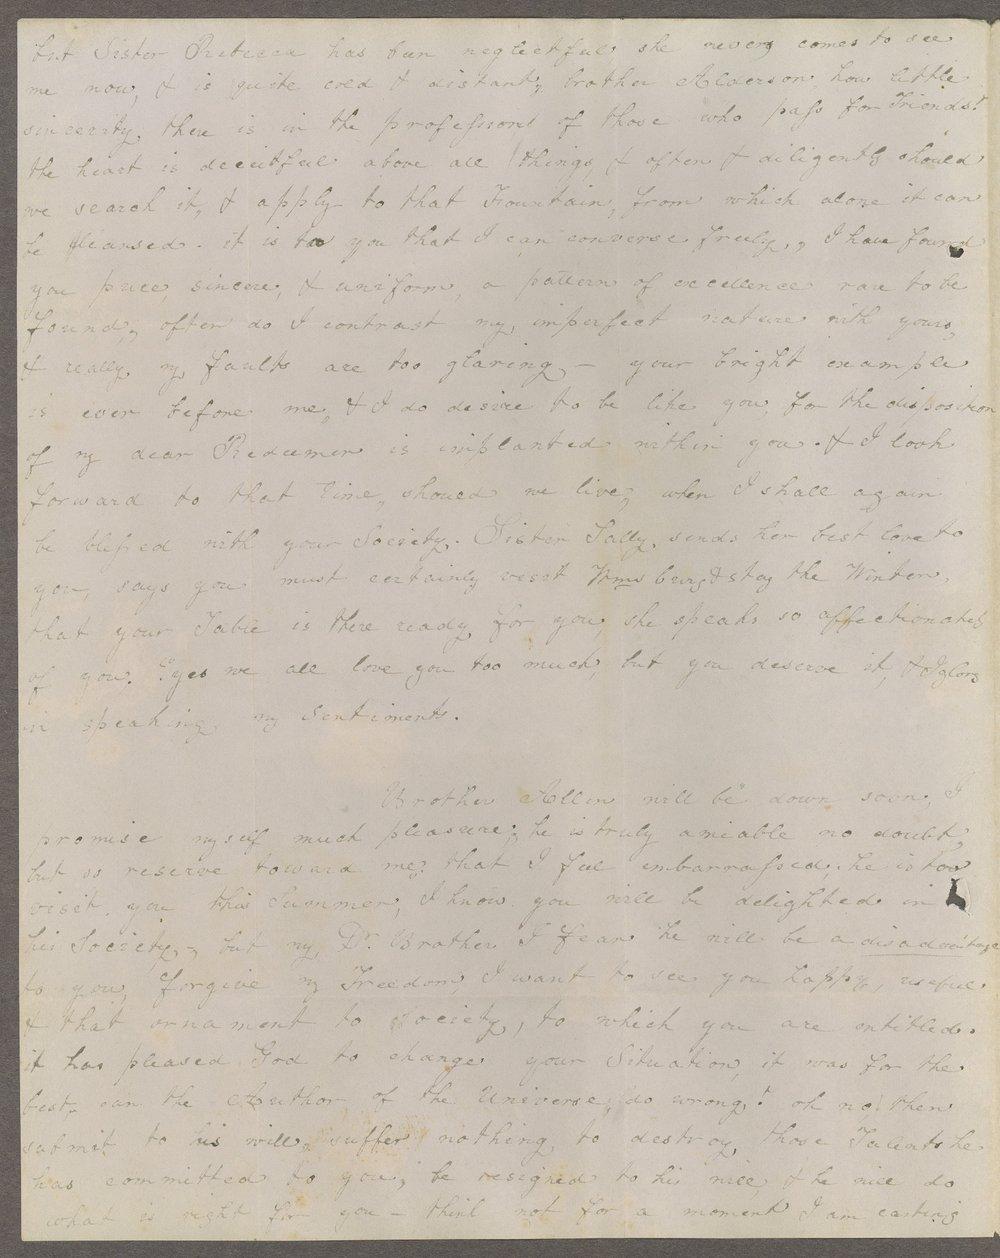 Louisa E. White to Lewis Allen Alderson - 6